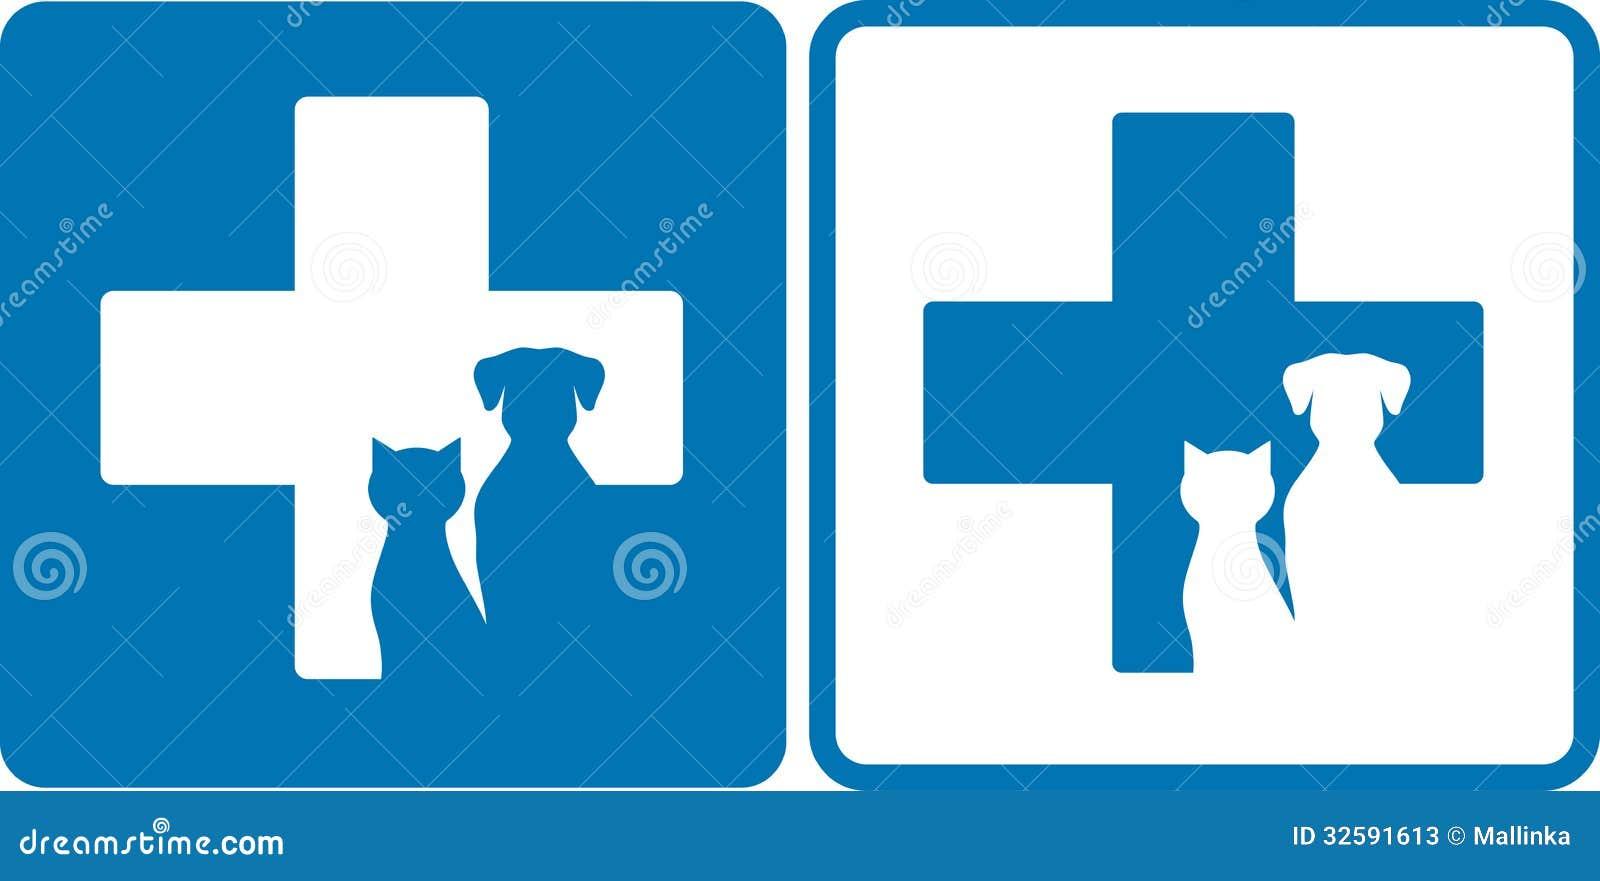 veterinary symbol stock photos   image 32591613